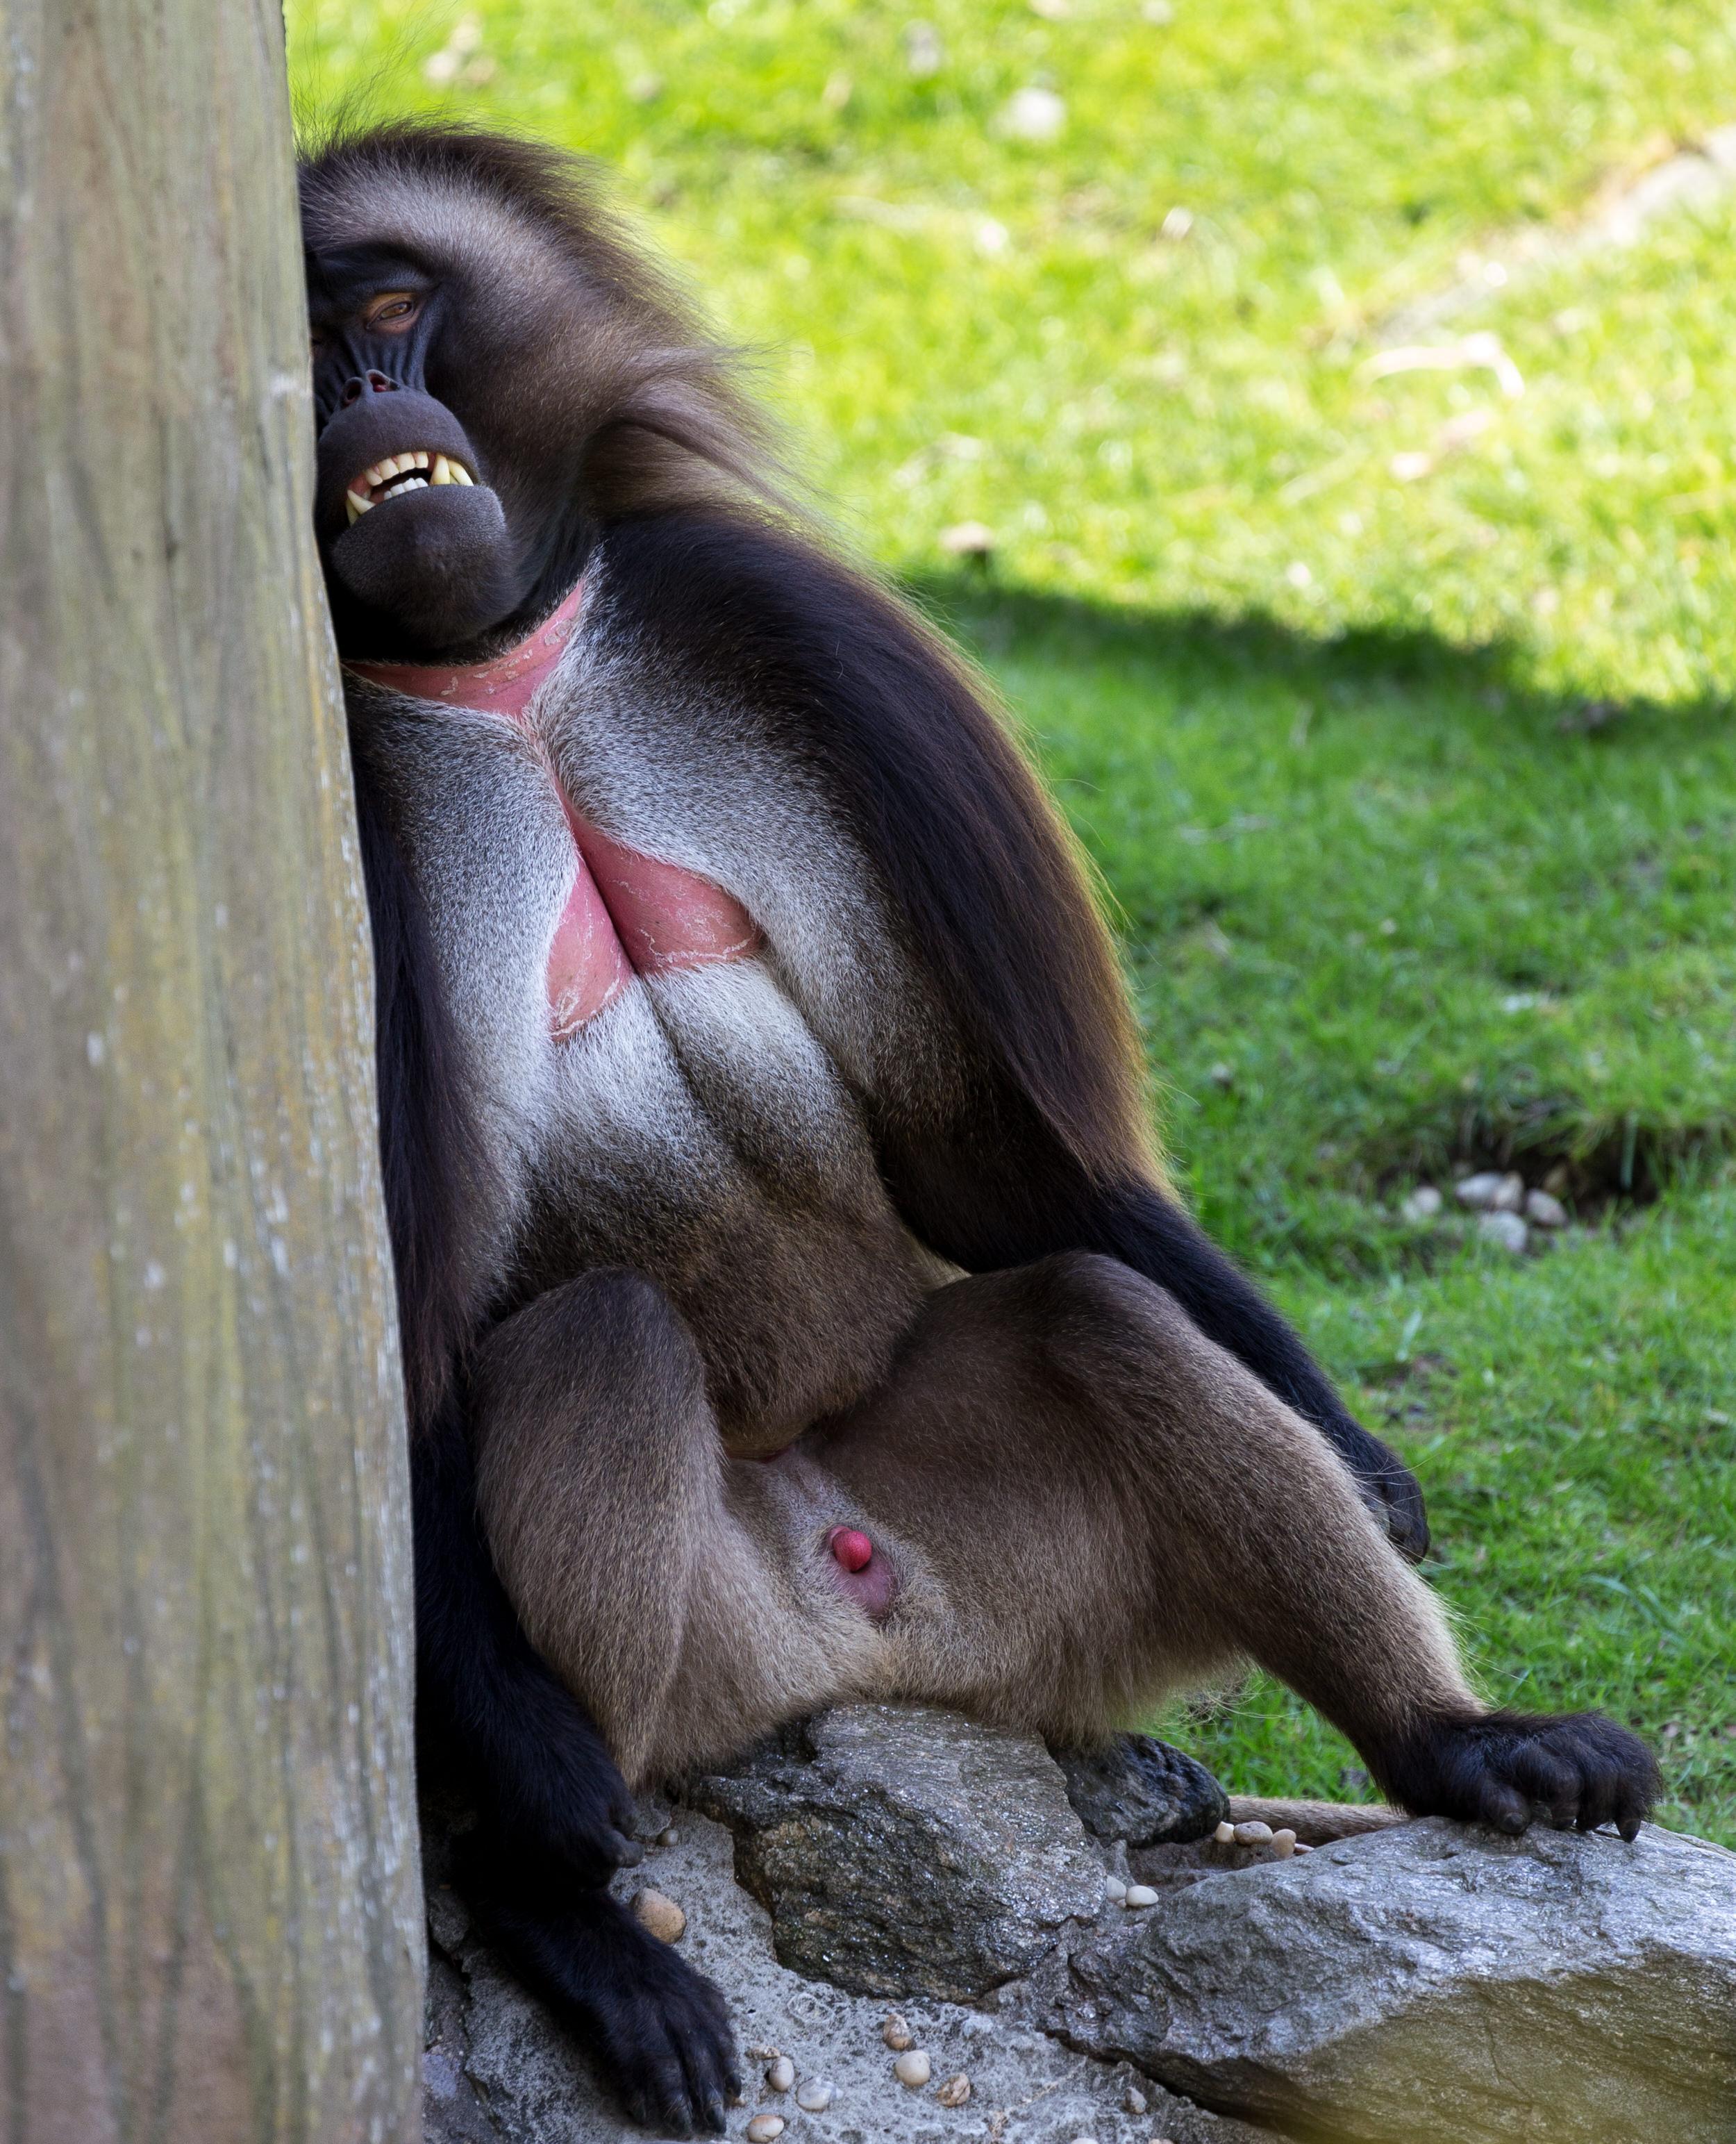 Orangutan at the Bronx Zoo